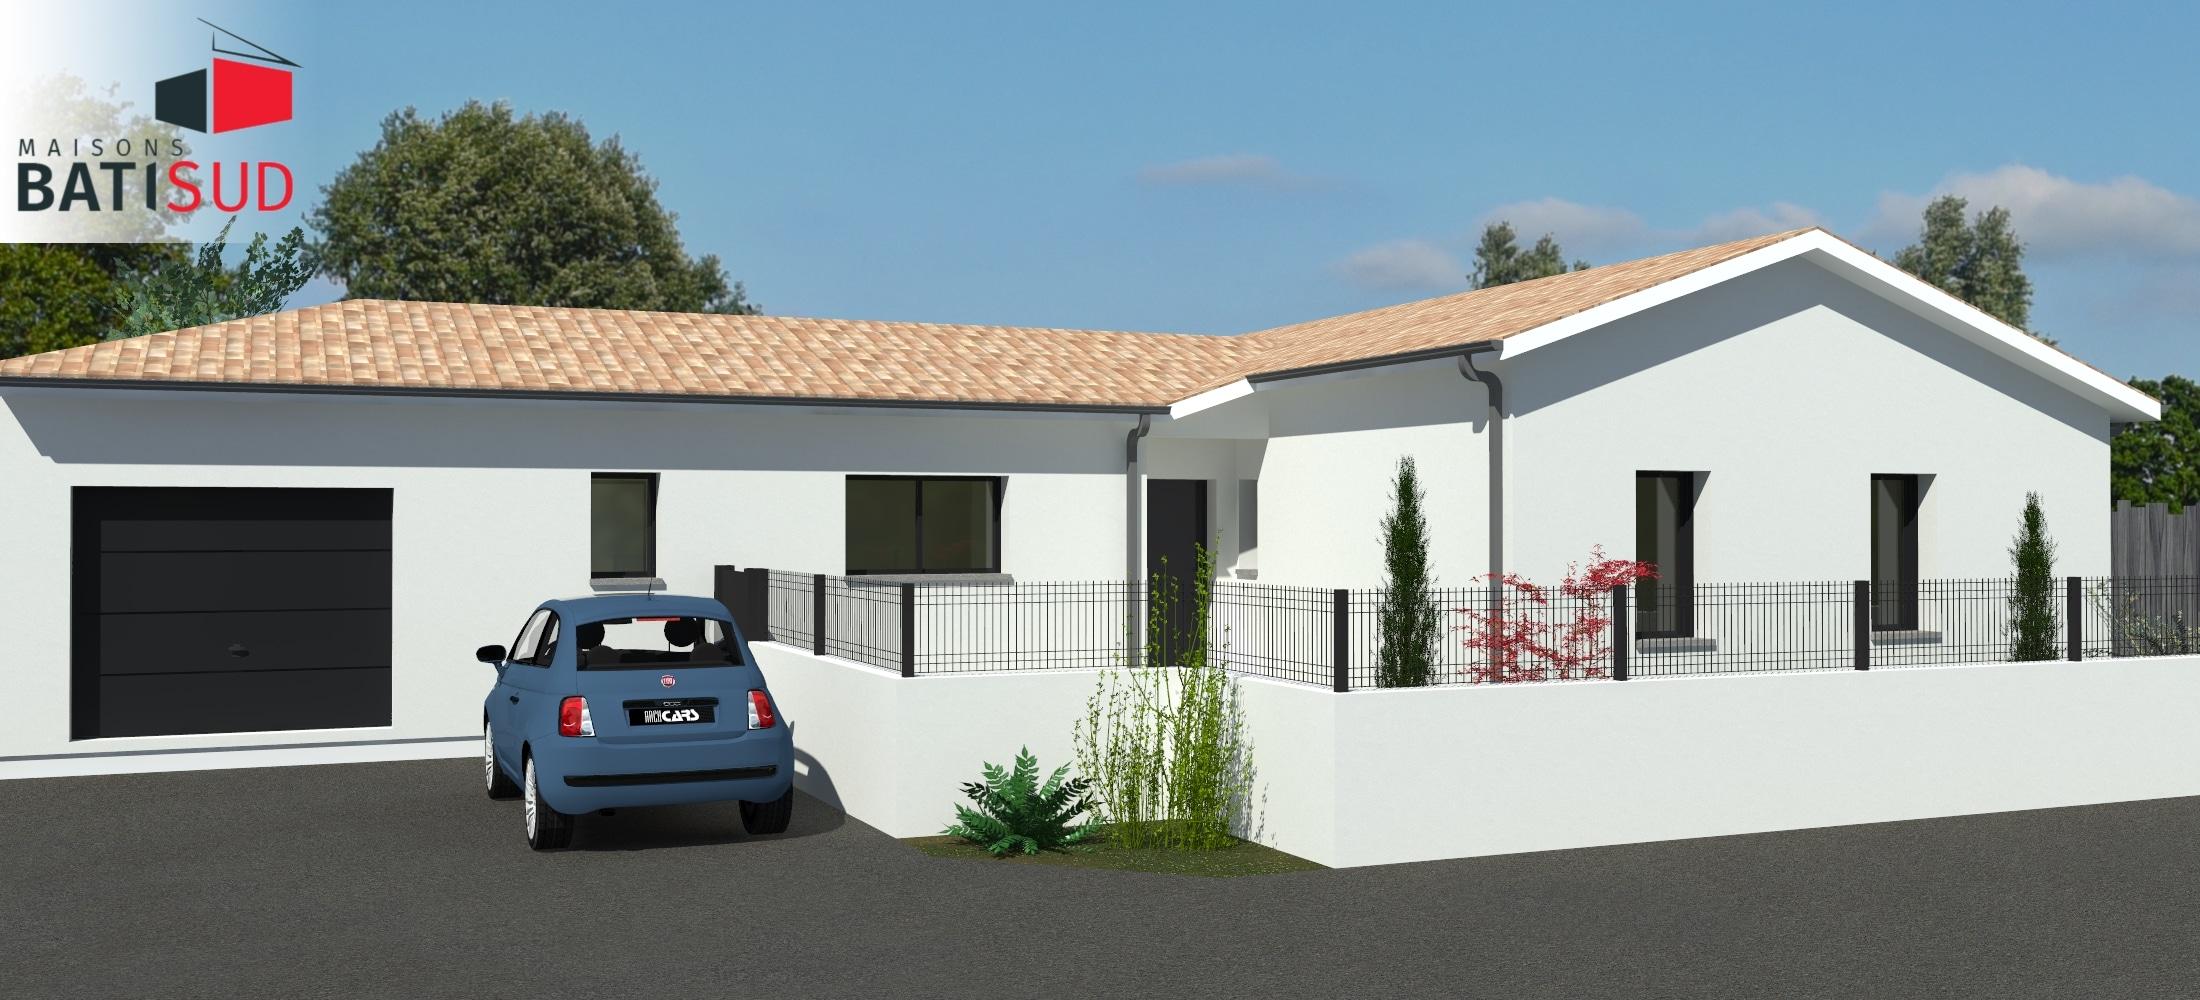 maisons bati sud maison 120m saint medard en jalles garage. Black Bedroom Furniture Sets. Home Design Ideas